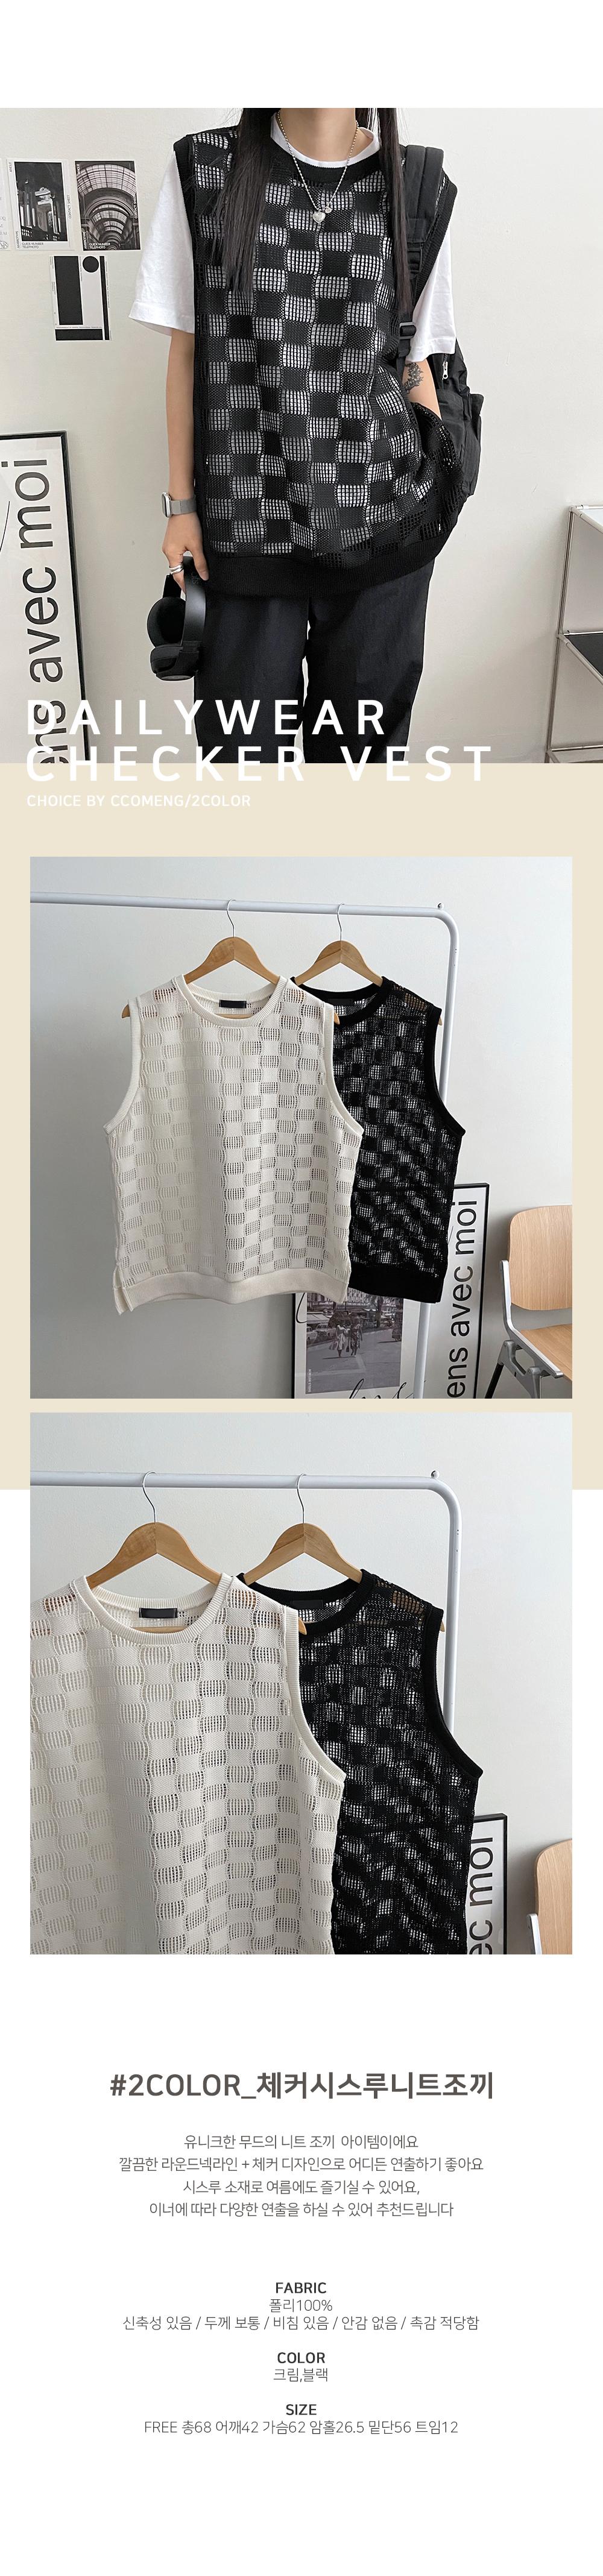 Checker-Through Knitwear Vest